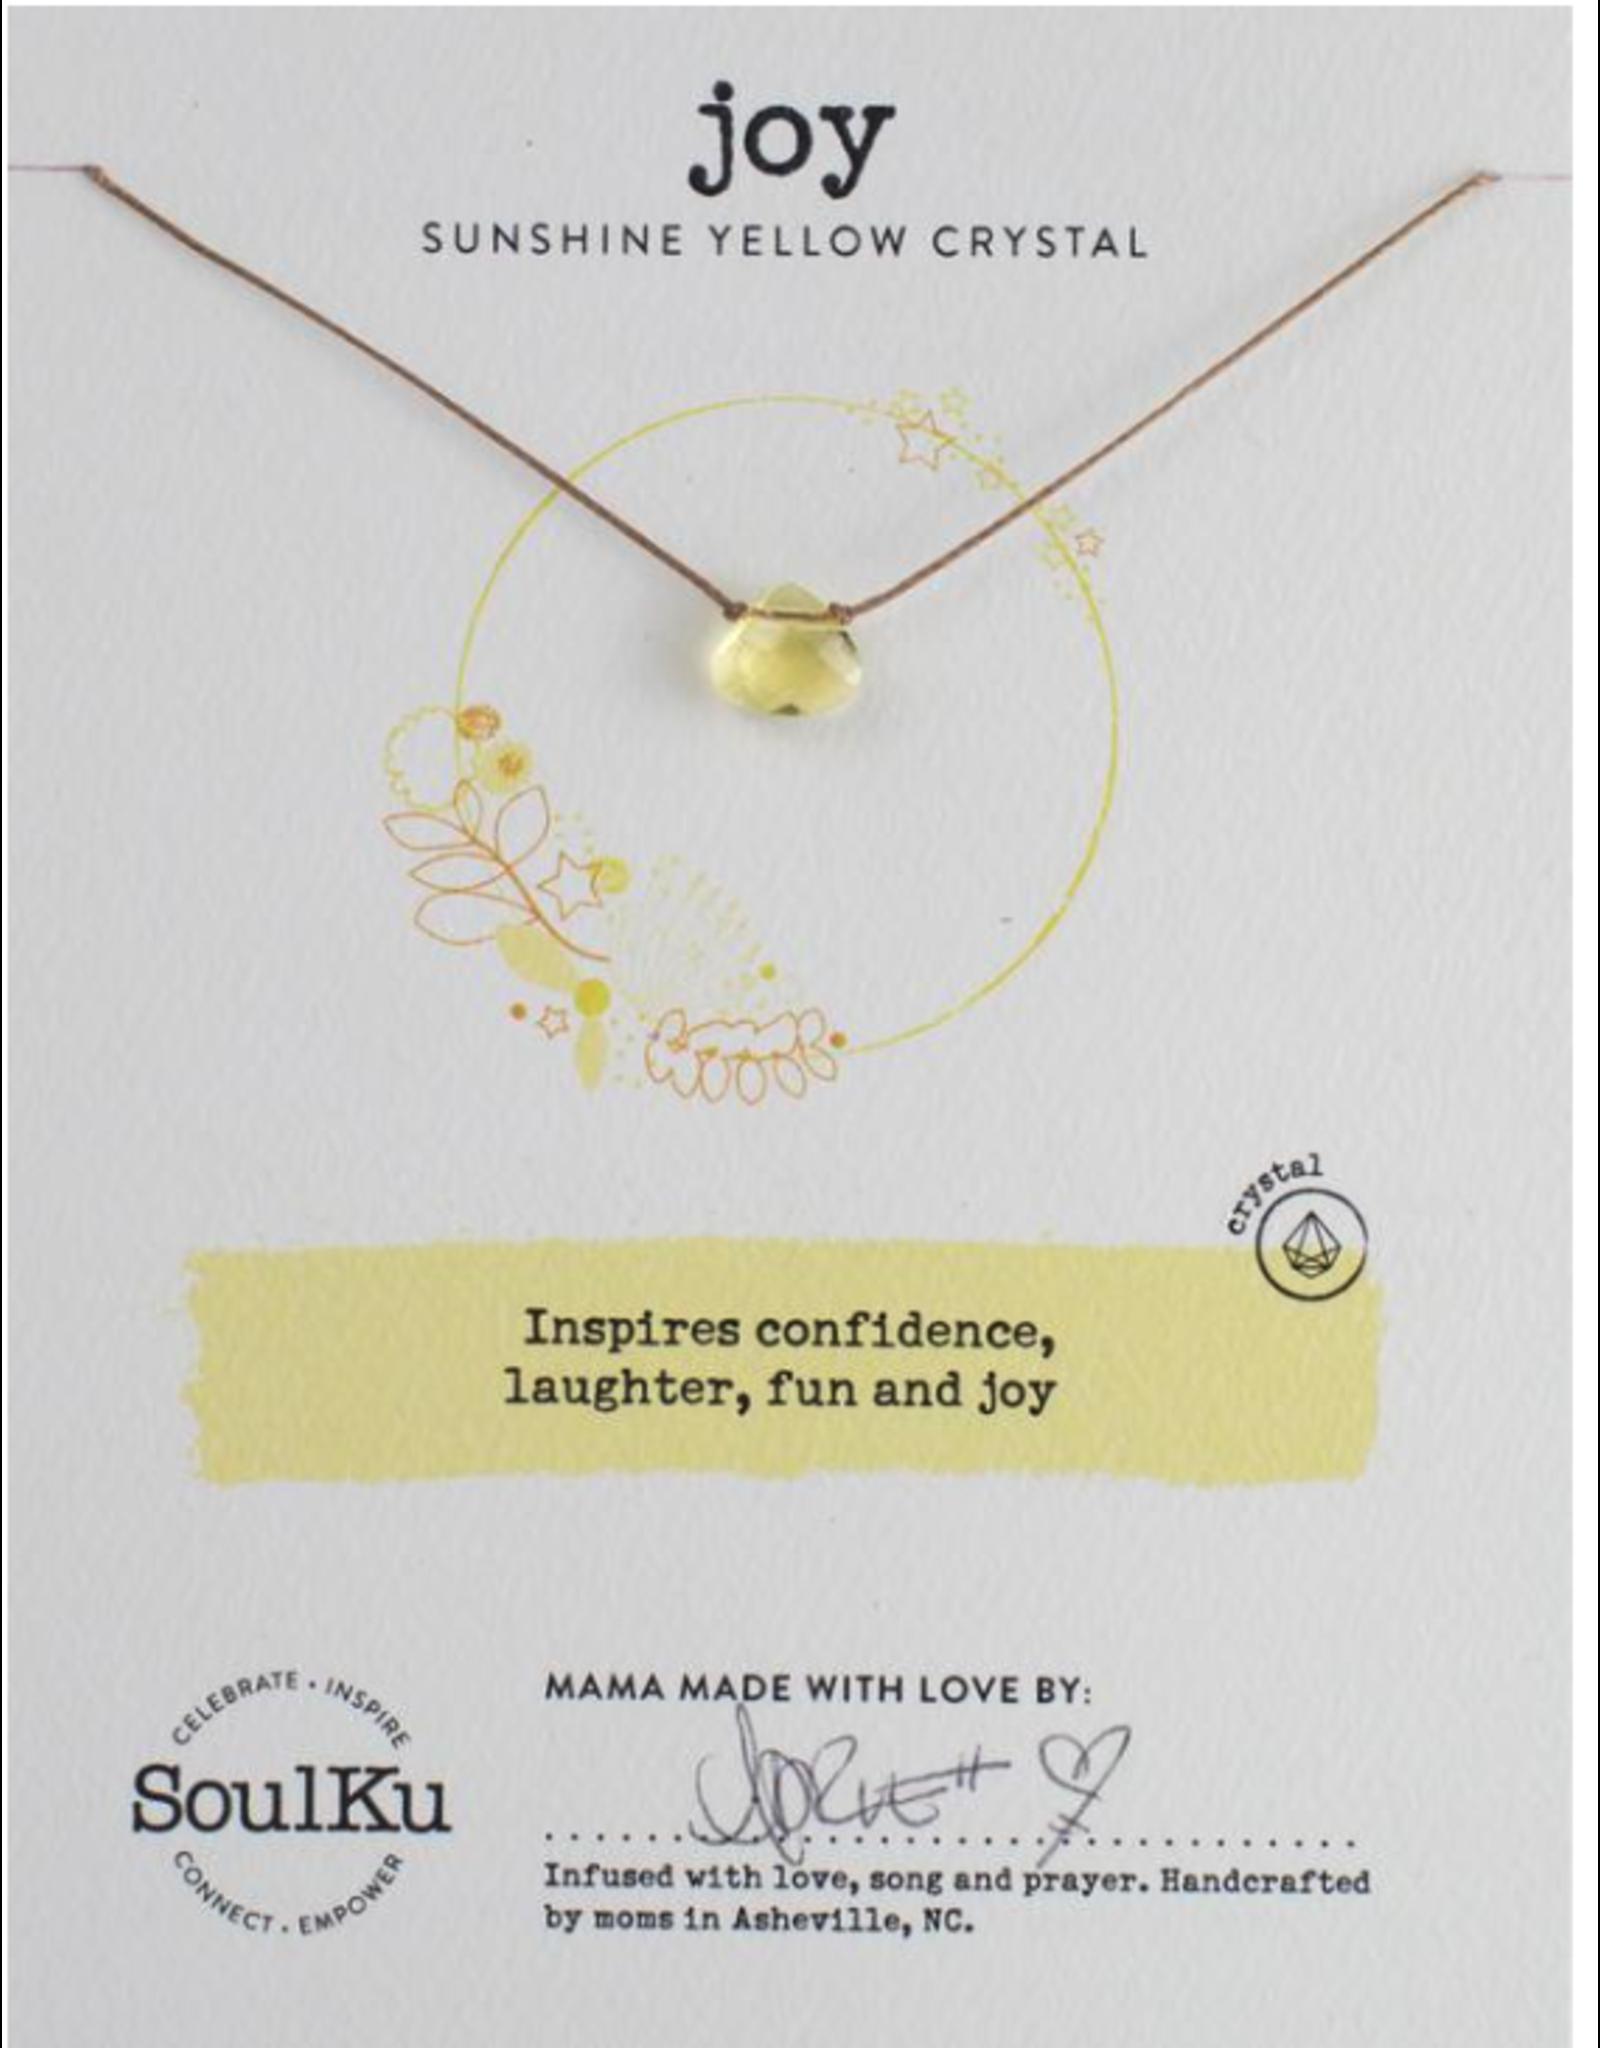 Sunshine Yellow Crystal Necklace For Joy - SoulKu